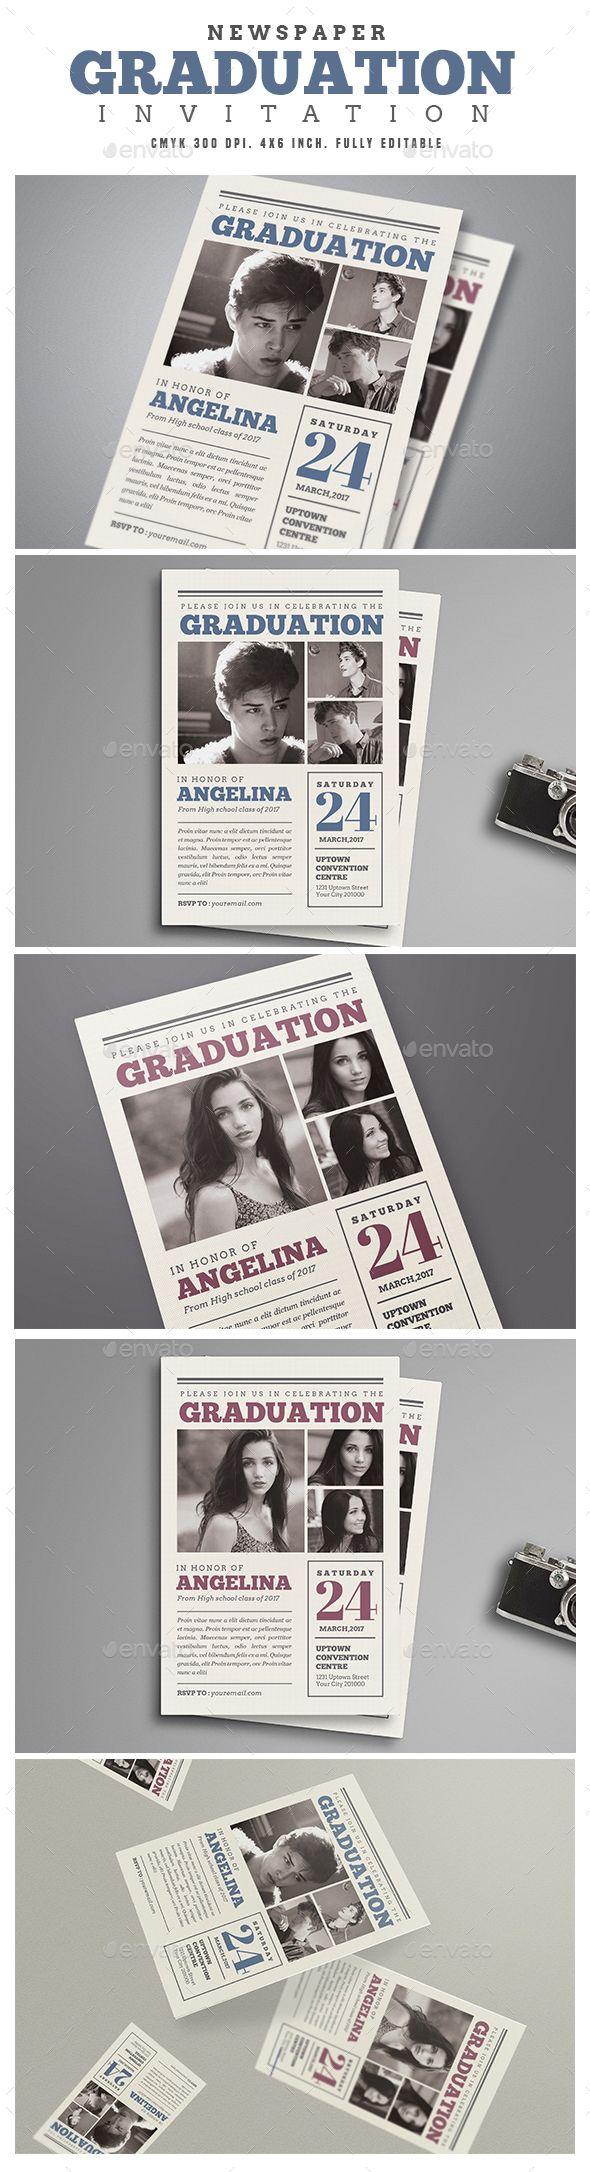 Newspaper Graduation invitation   Fonts-logos-icons   Pinterest ...